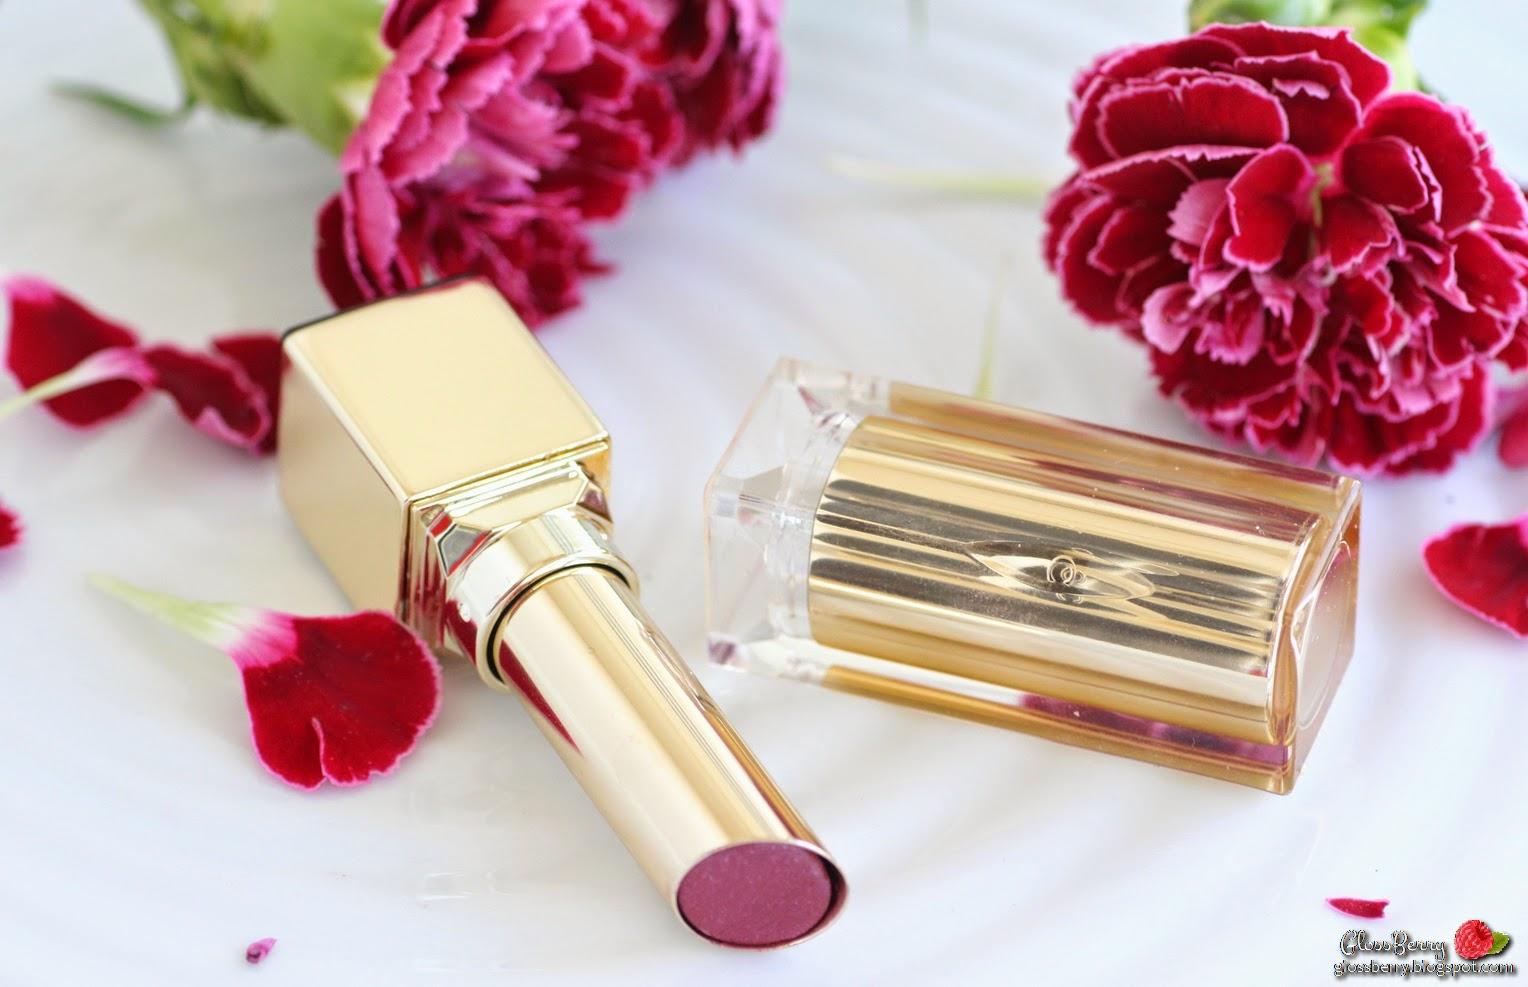 Clarins - Rouge Eclat - 06 True Aubergine review swatches lipswatch lips plum winter lipcolor beauty blog גלוסברי בלוג ביוטי איפור וטיפוח שפתון קלרינס מומלץ לסתיו חורף שזיף חציל סגול סקירה